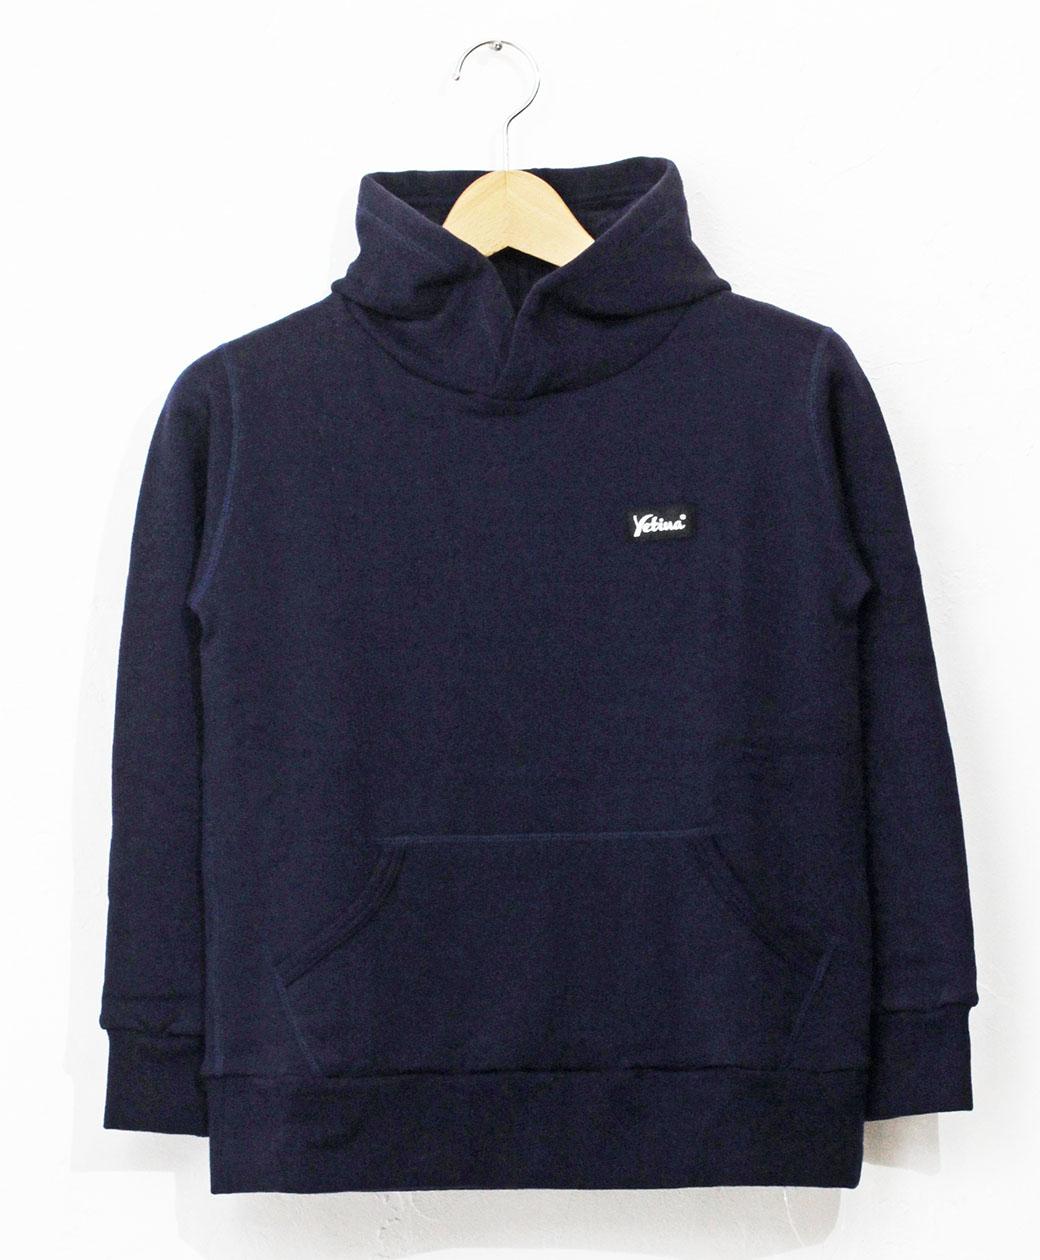 yetina kids pullover hoodie(sky blue)